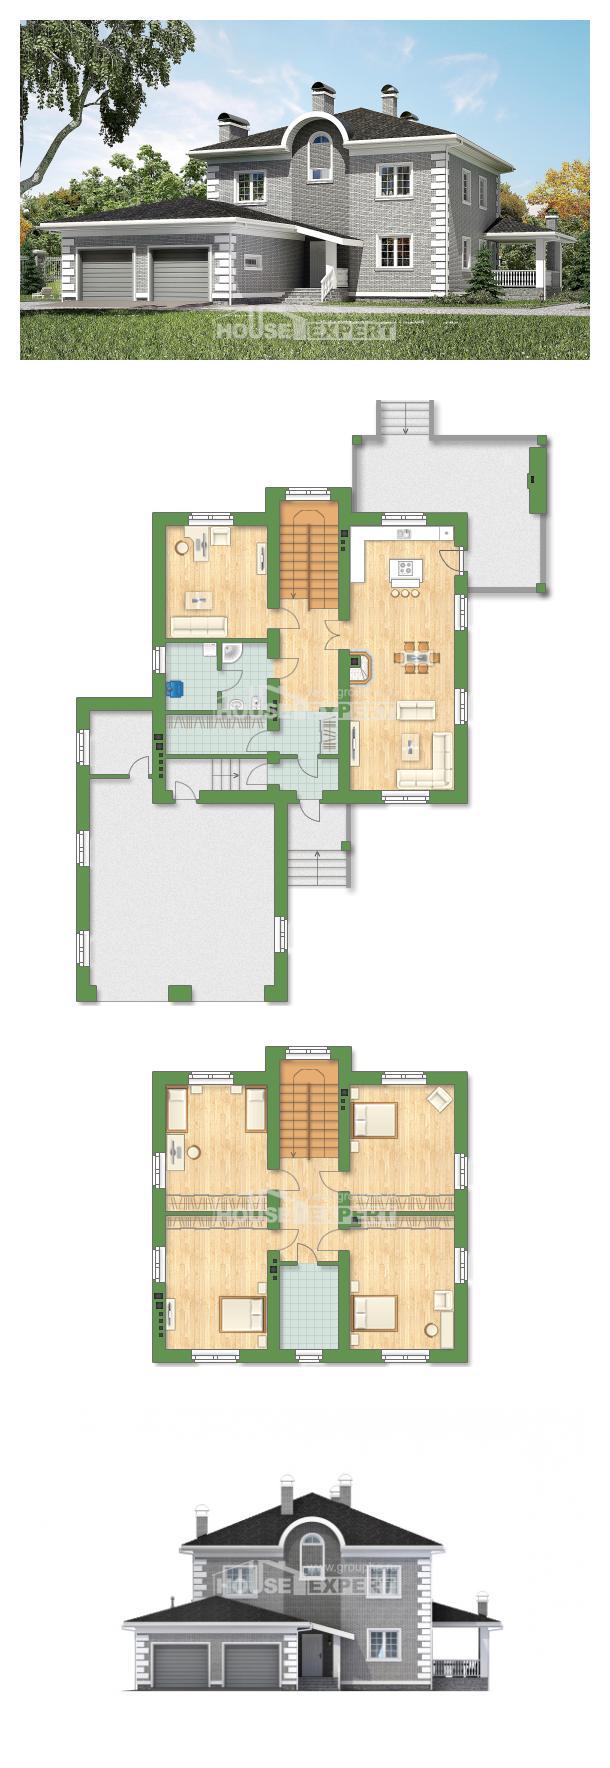 Proyecto de casa 245-004-L   House Expert